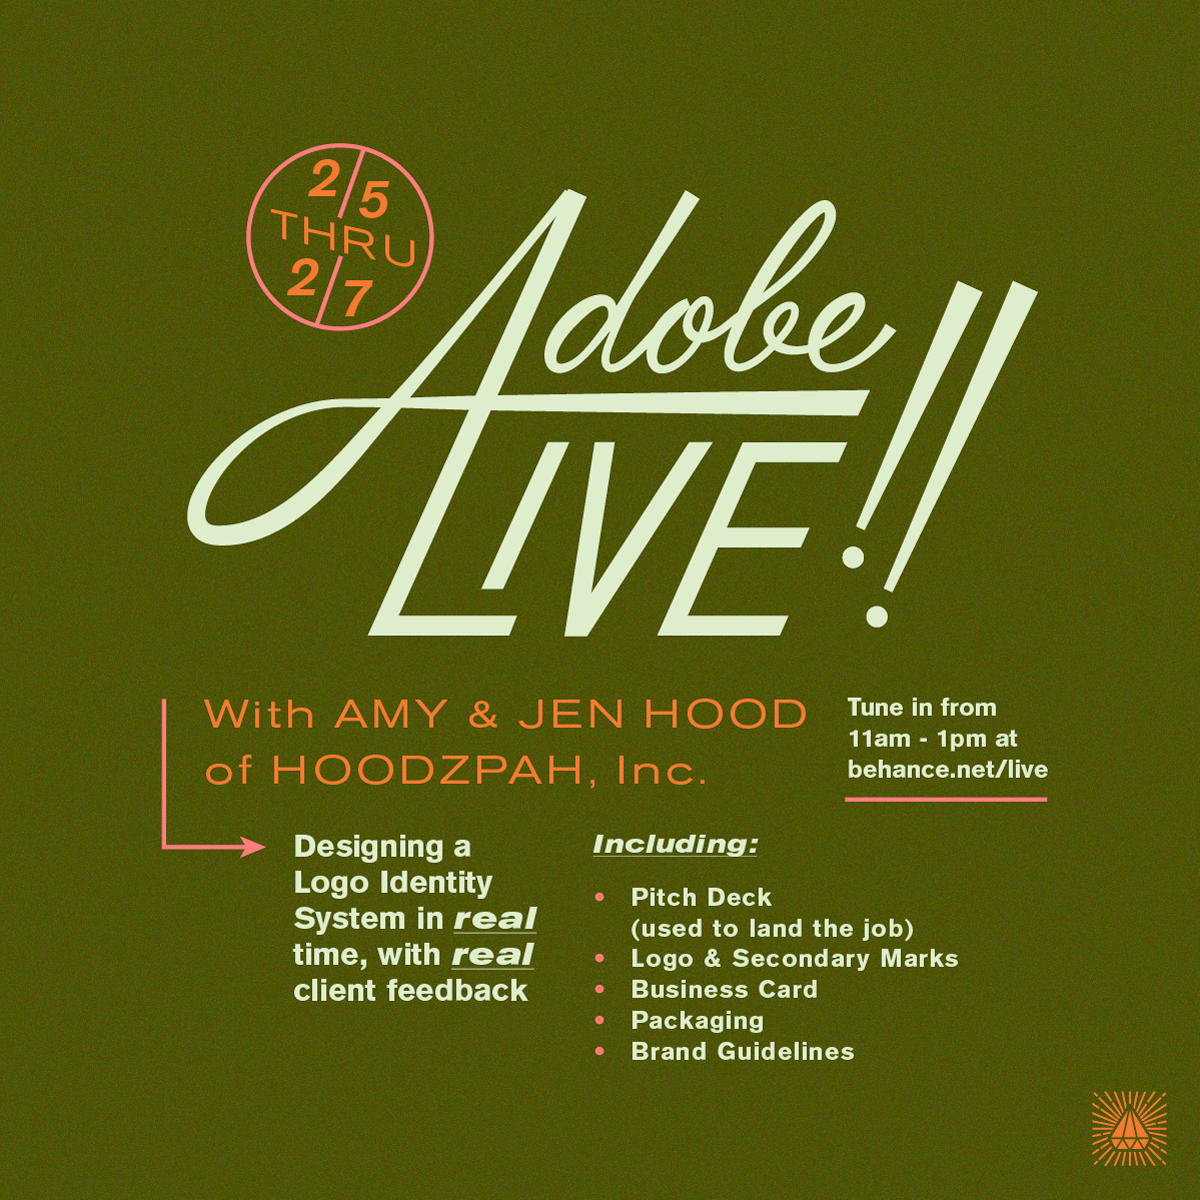 Adobe live promo final